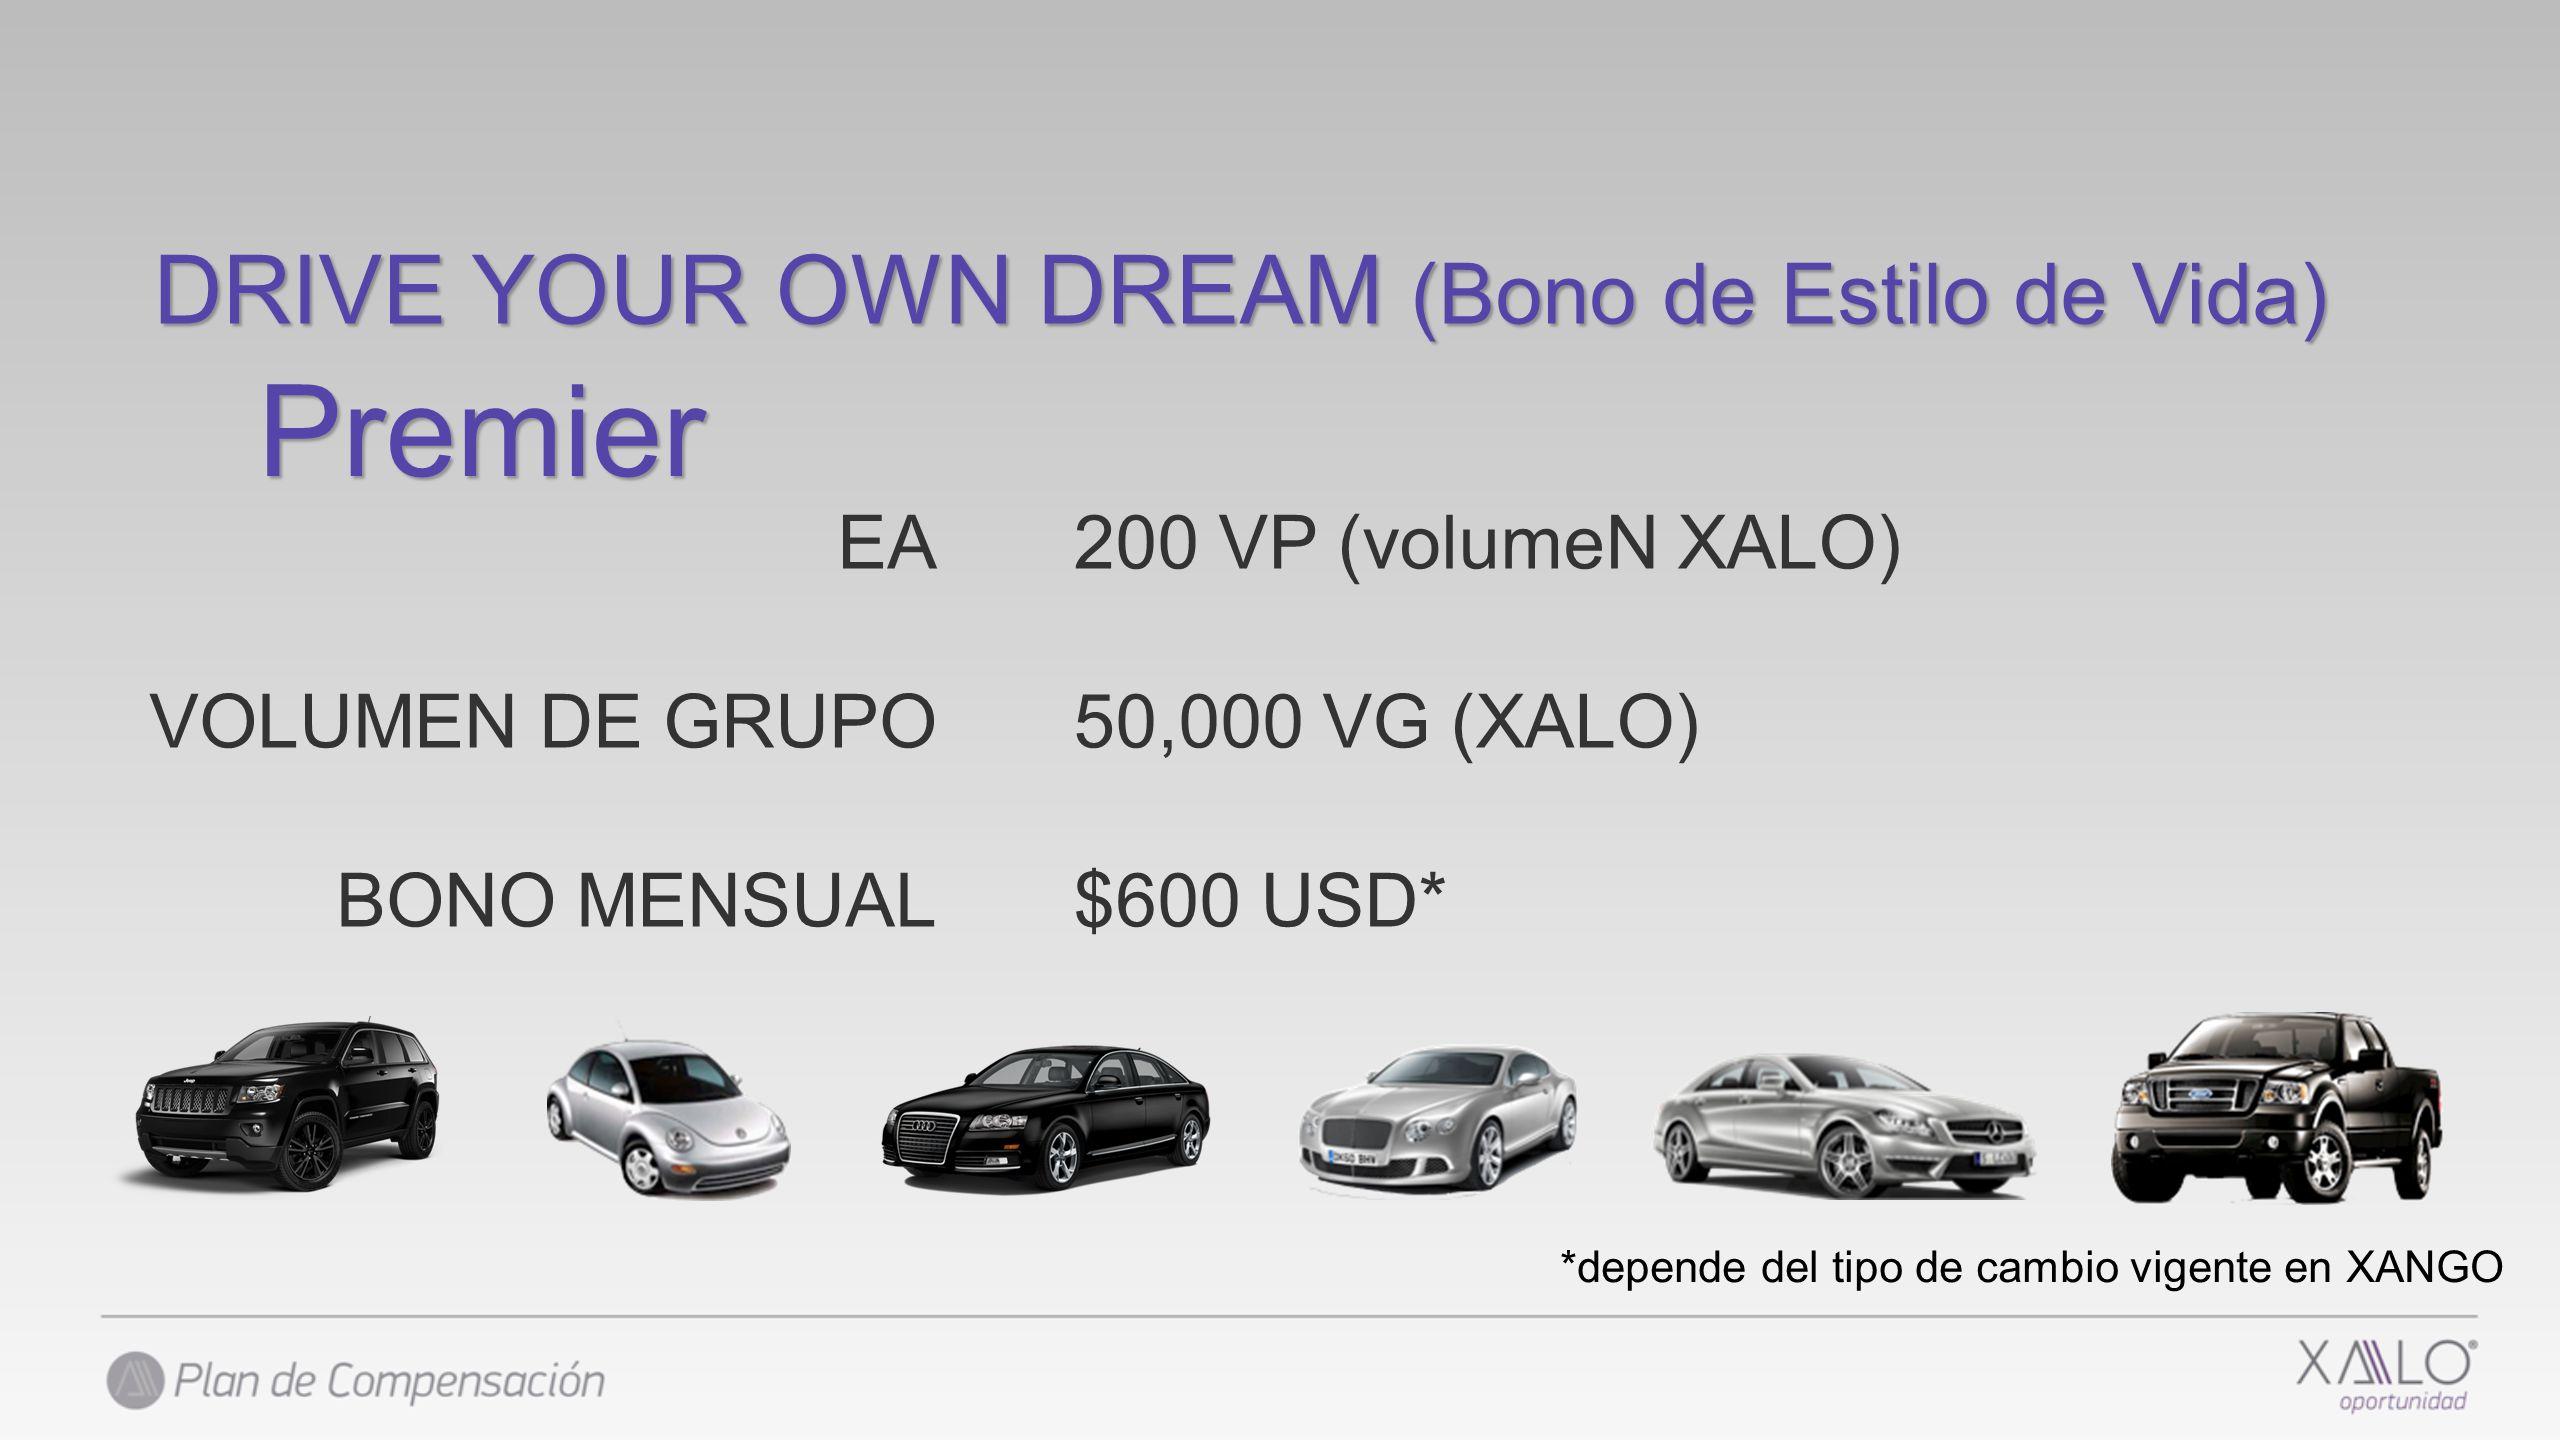 DRIVE YOUR OWN DREAM (Bono de Estilo de Vida) Premier 200 VP (volumeN XALO) 50,000 VG (XALO) $600 USD* EA VOLUMEN DE GRUPO BONO MENSUAL *depende del t